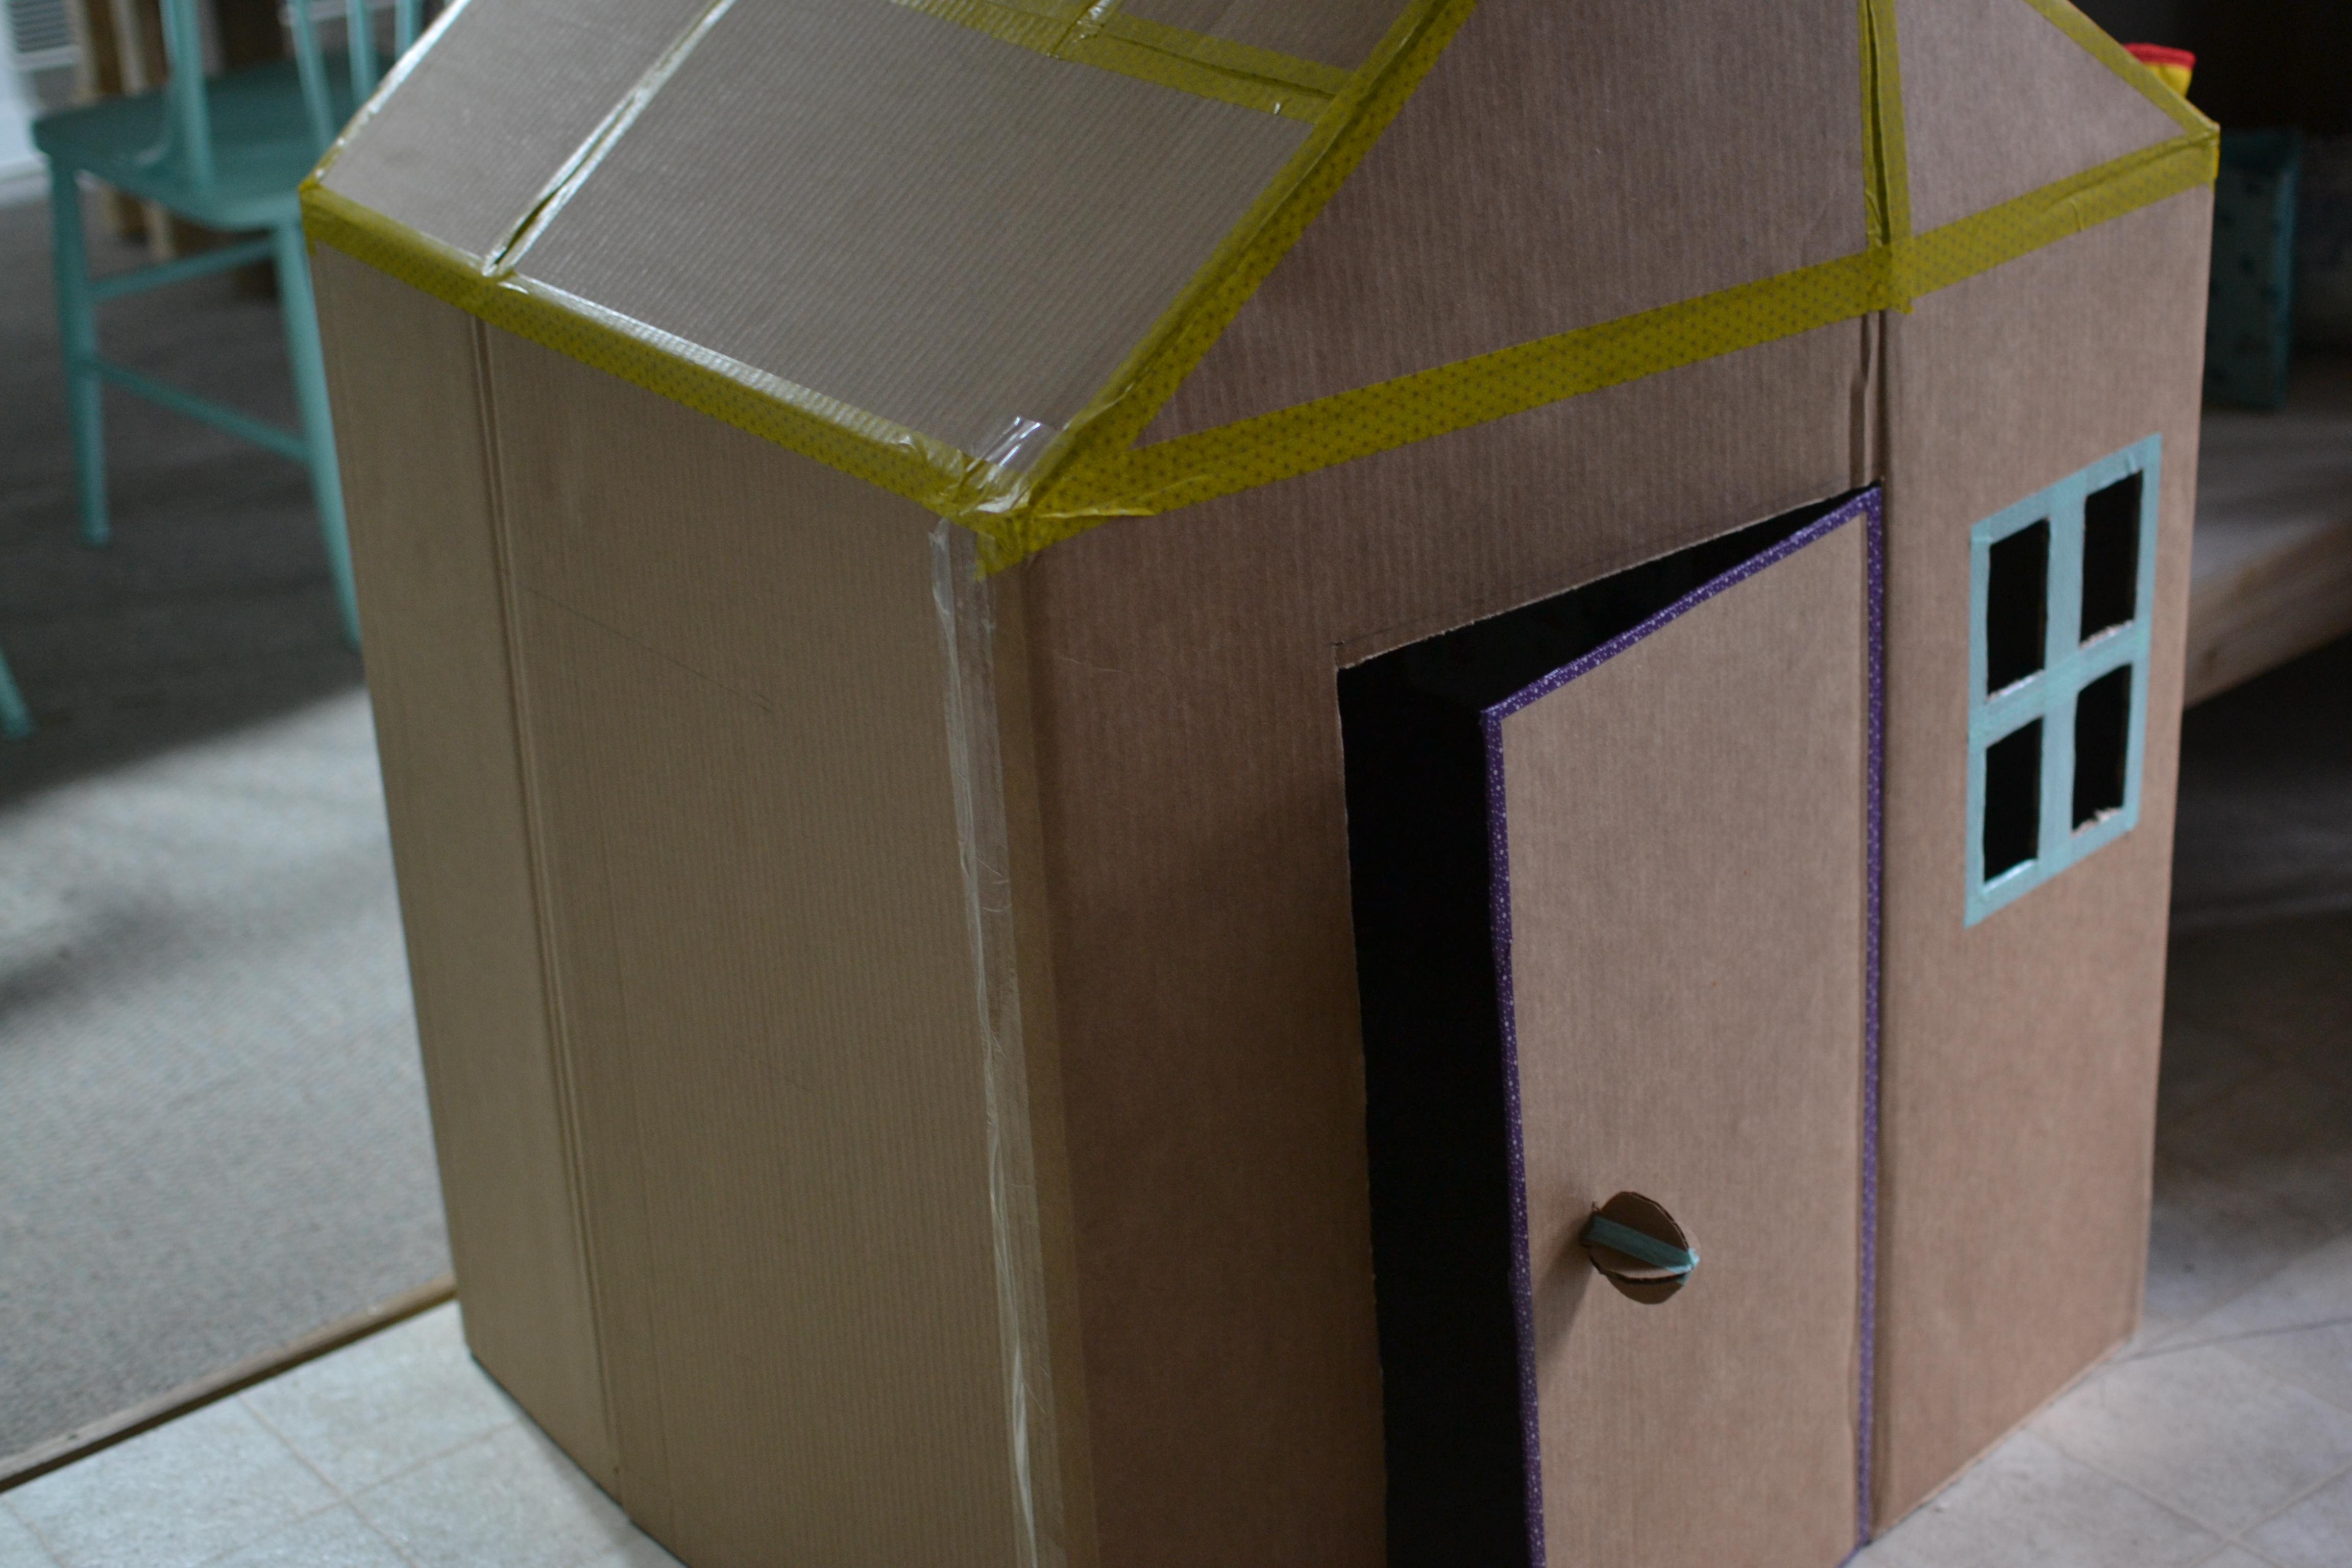 Cabane En Carton Diy diy la cabane des tout-petits – homemade perrinpimpim